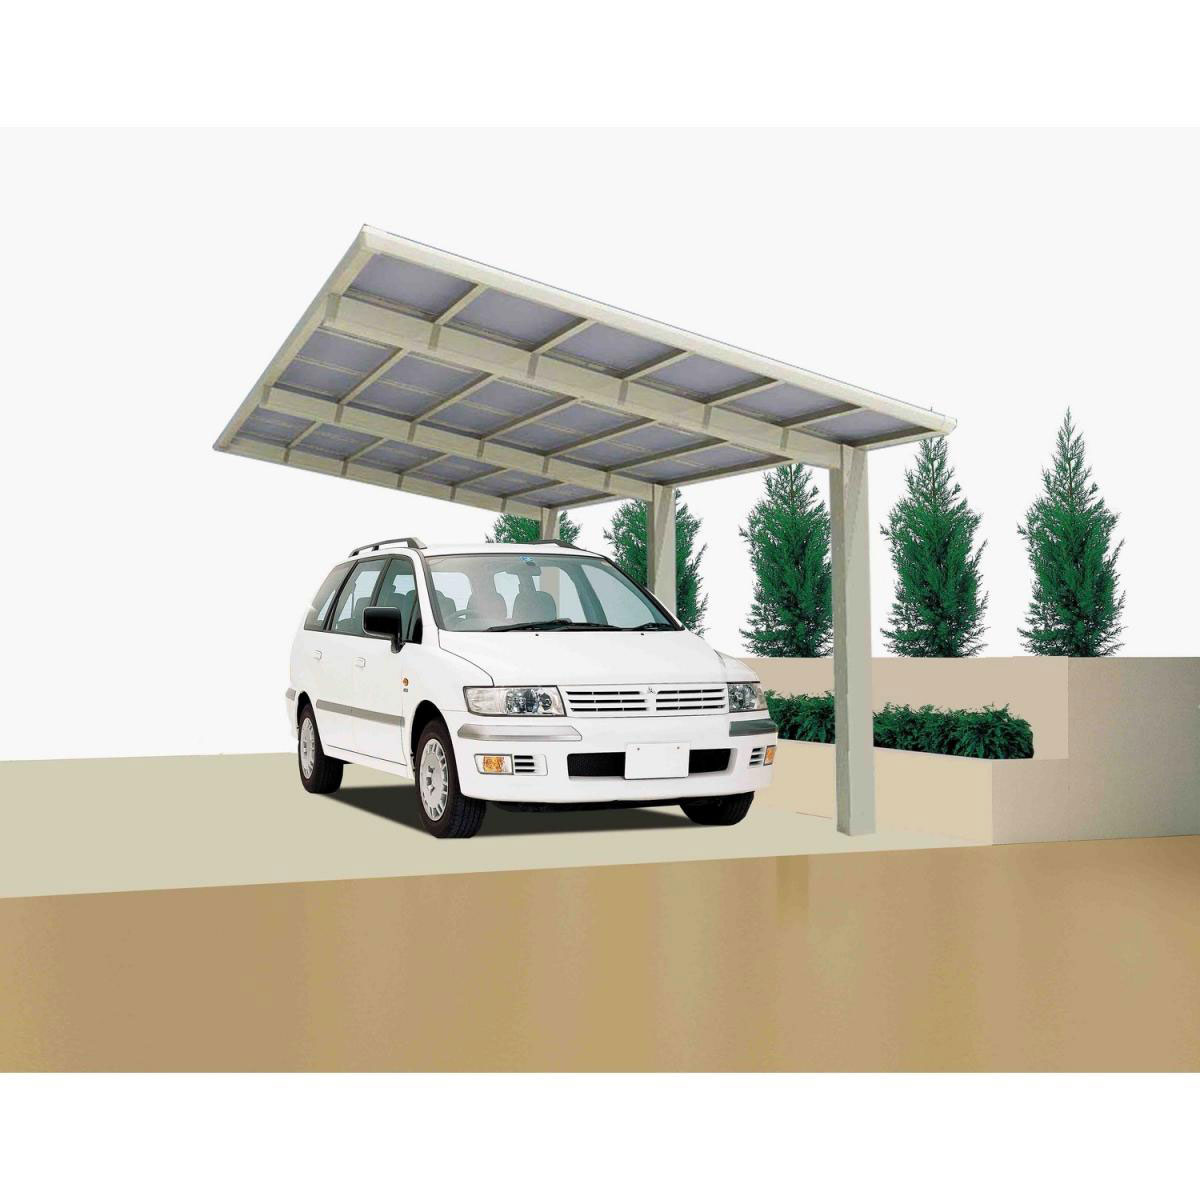 "Carports - Carport Alu ""Linea 170"" Edelstahl Look 213 kg m²  - Onlineshop Hellweg"